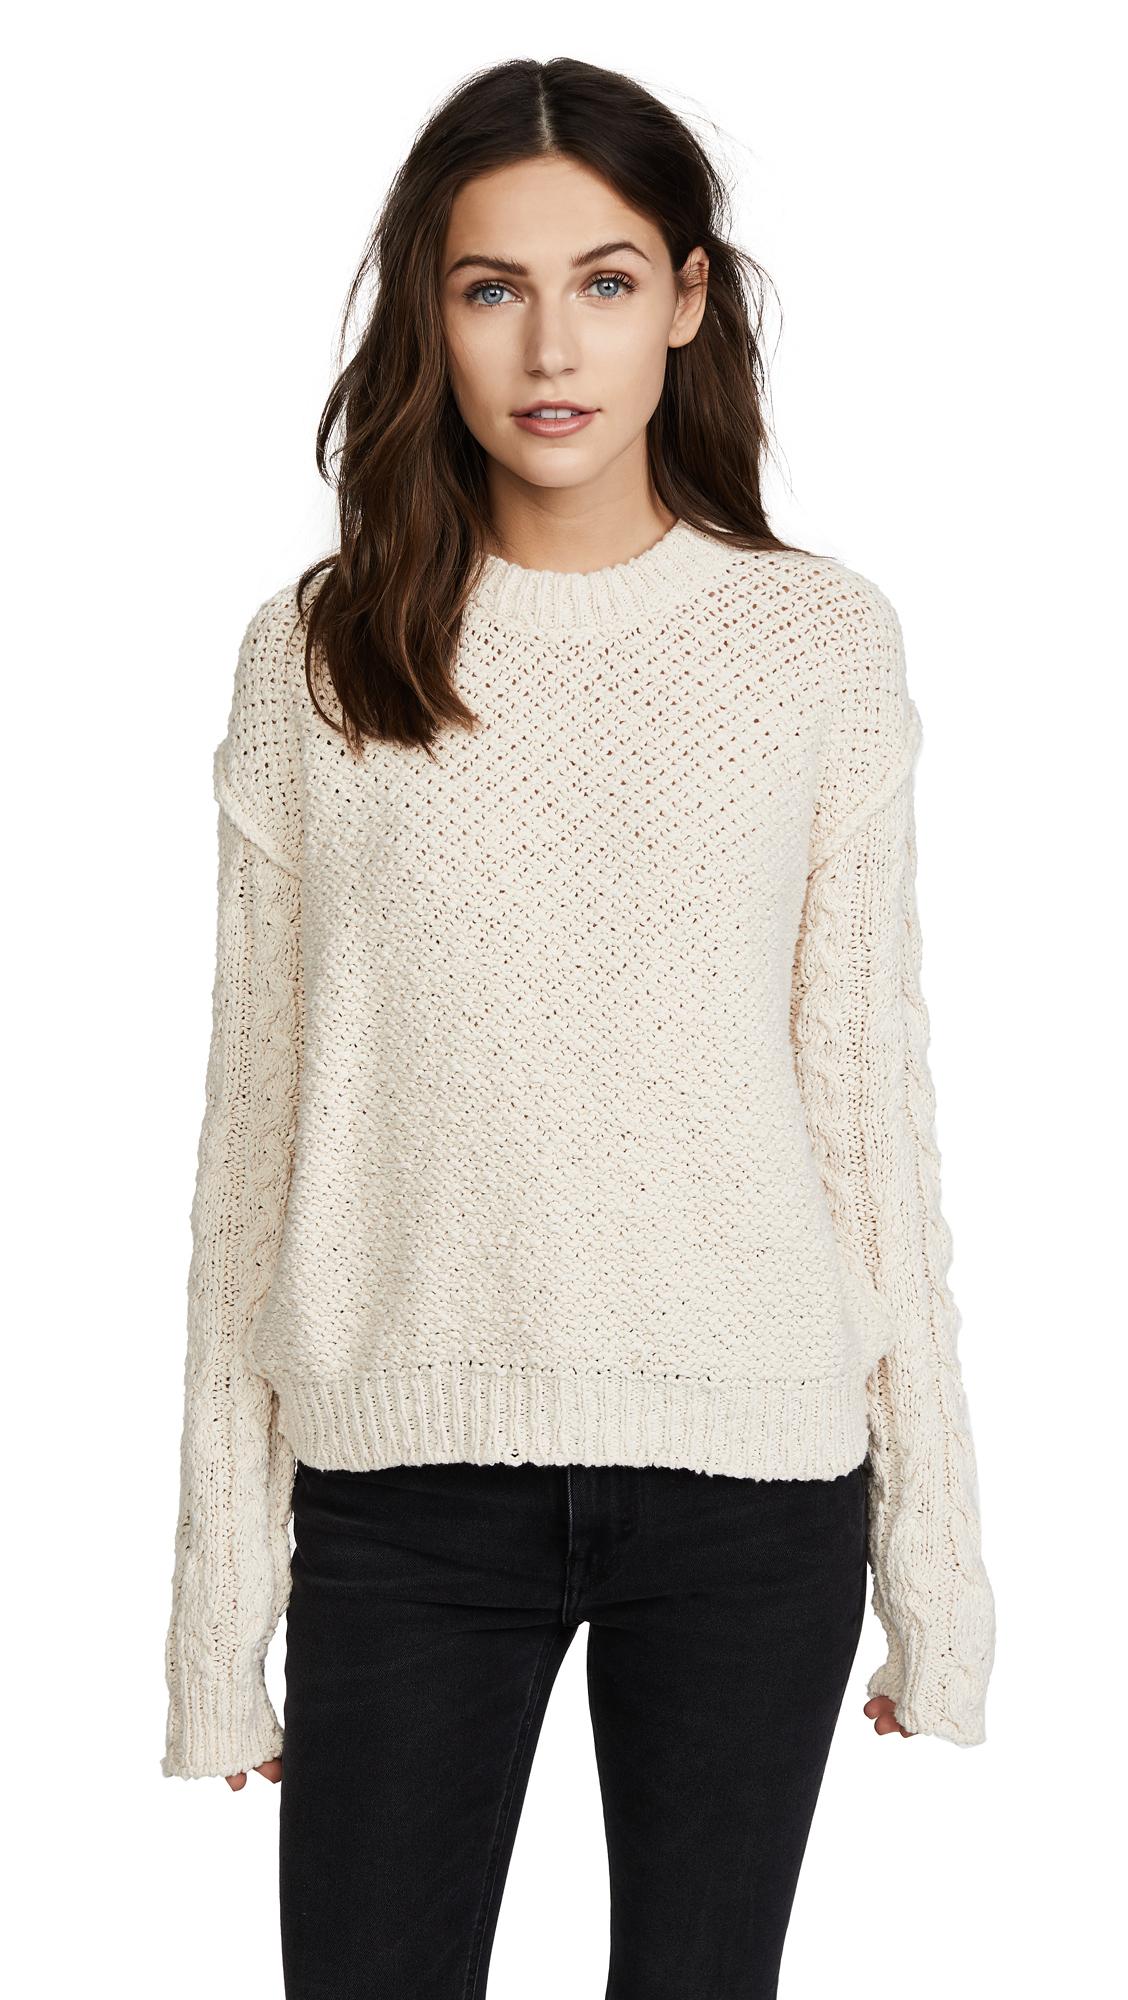 Acne Studios Hila Cable Sweater - Off White